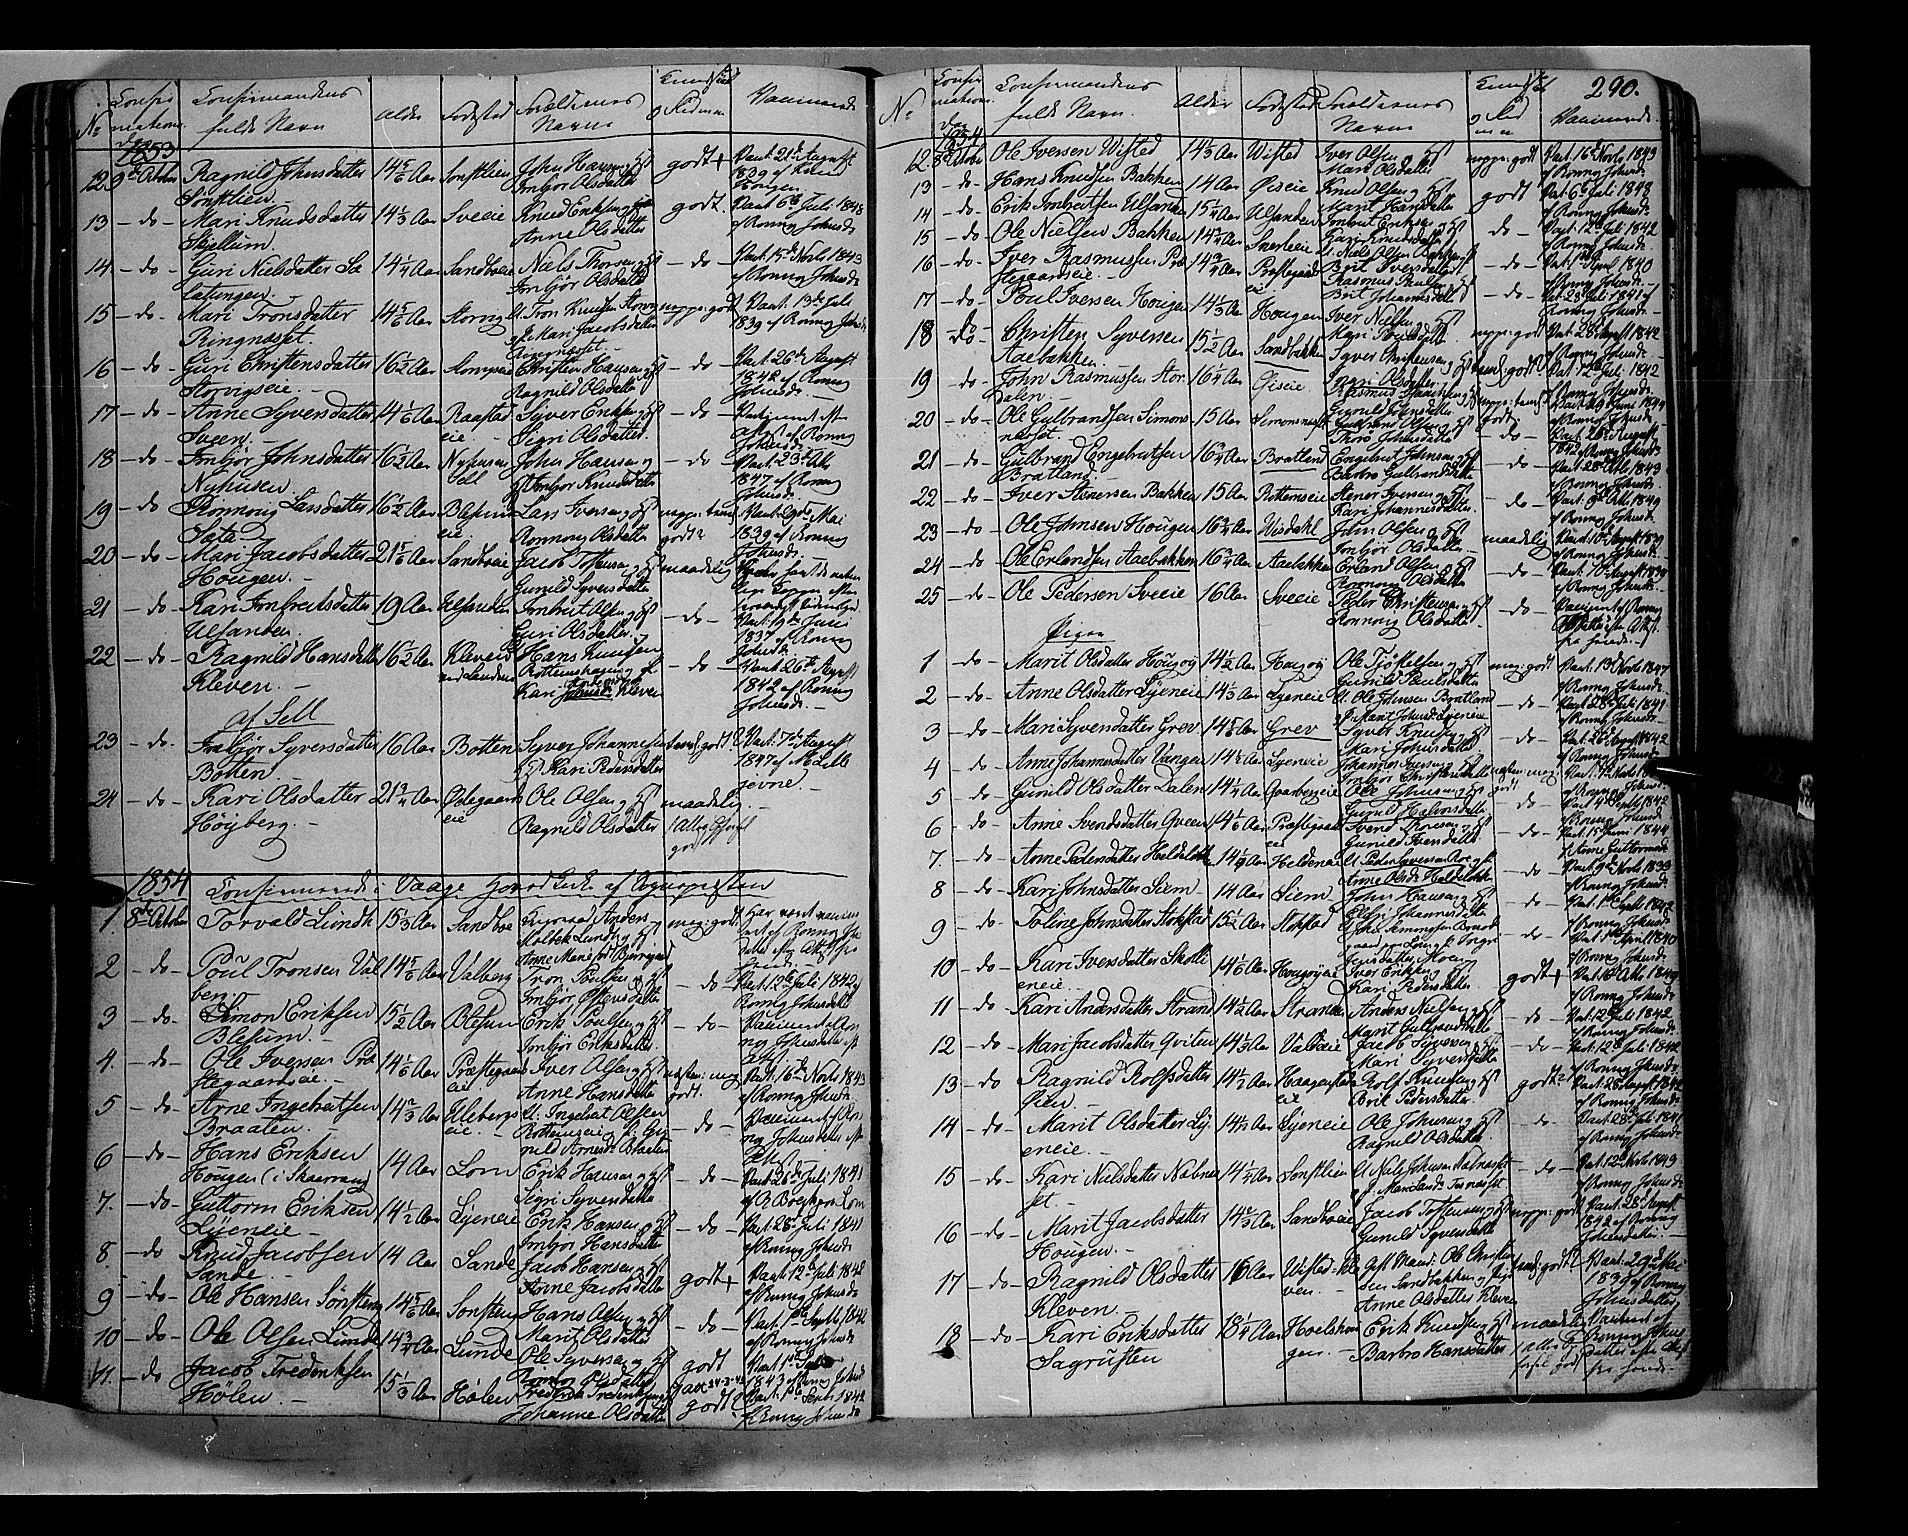 SAH, Vågå prestekontor, Ministerialbok nr. 5 /1, 1842-1856, s. 290